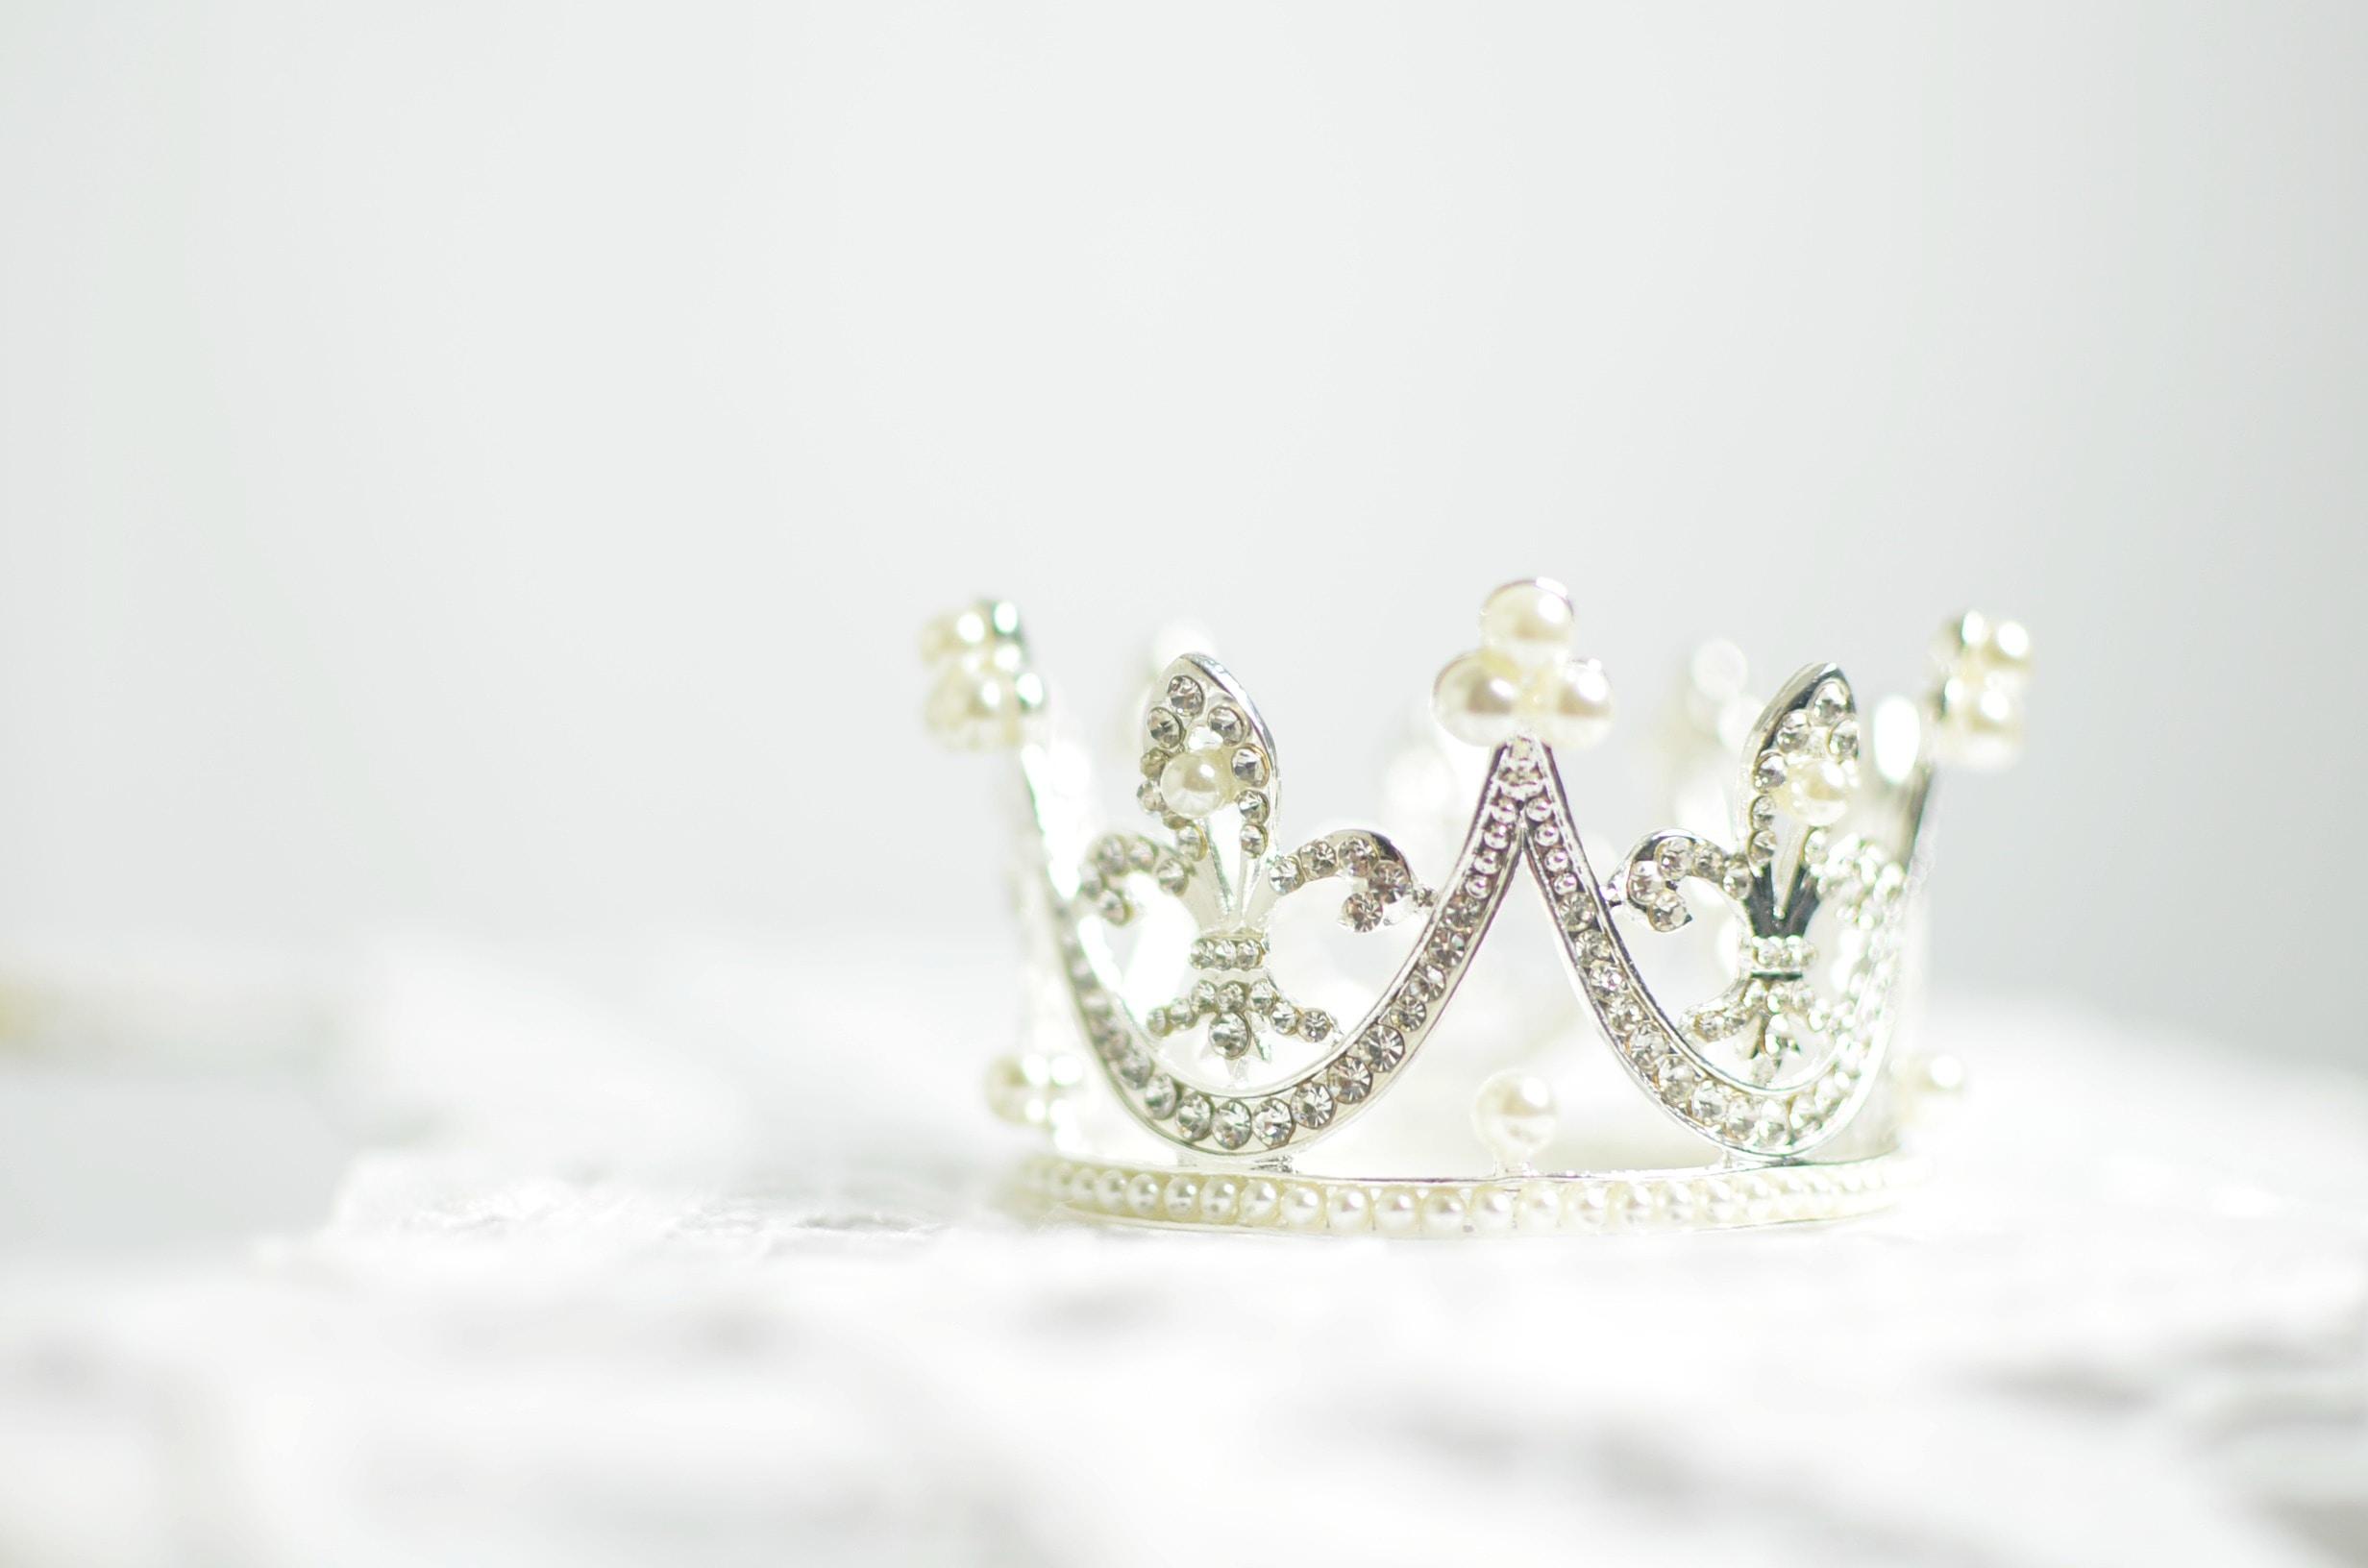 Princess Wallpapers: Free HD Download [500+ HQ]  Unsplash